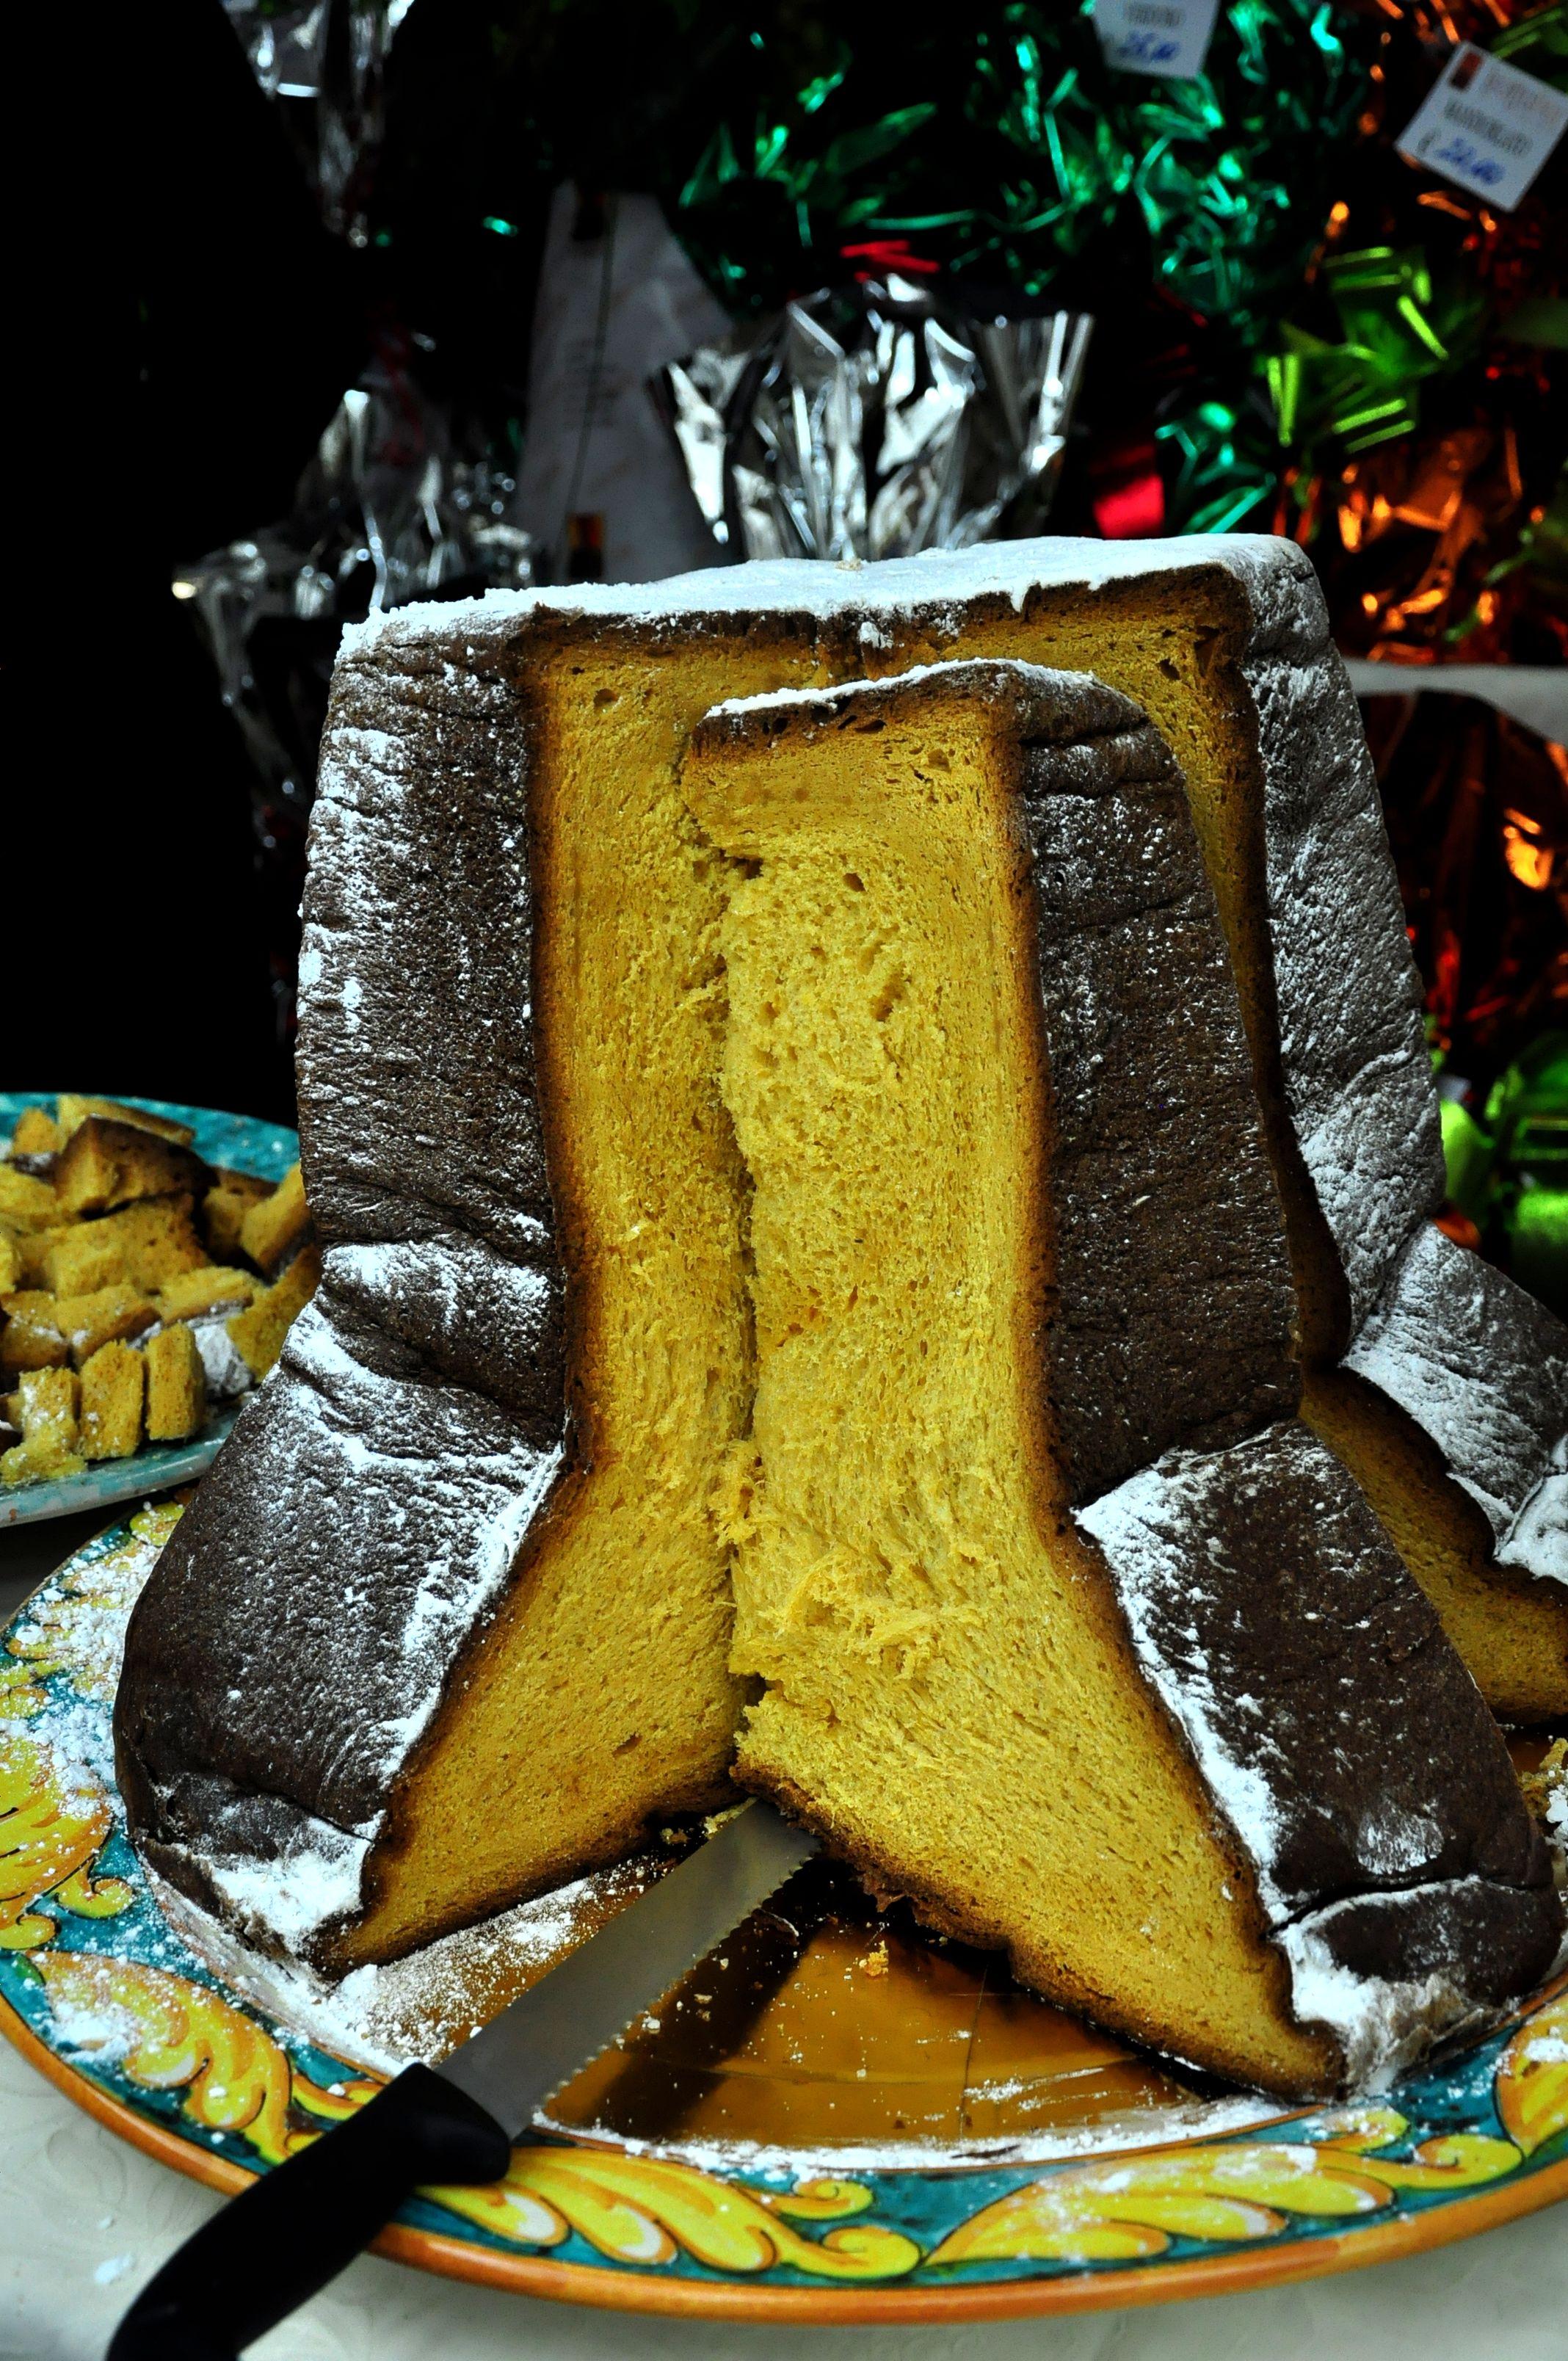 pandoro a christmas italian tradition - Italian Christmas Food